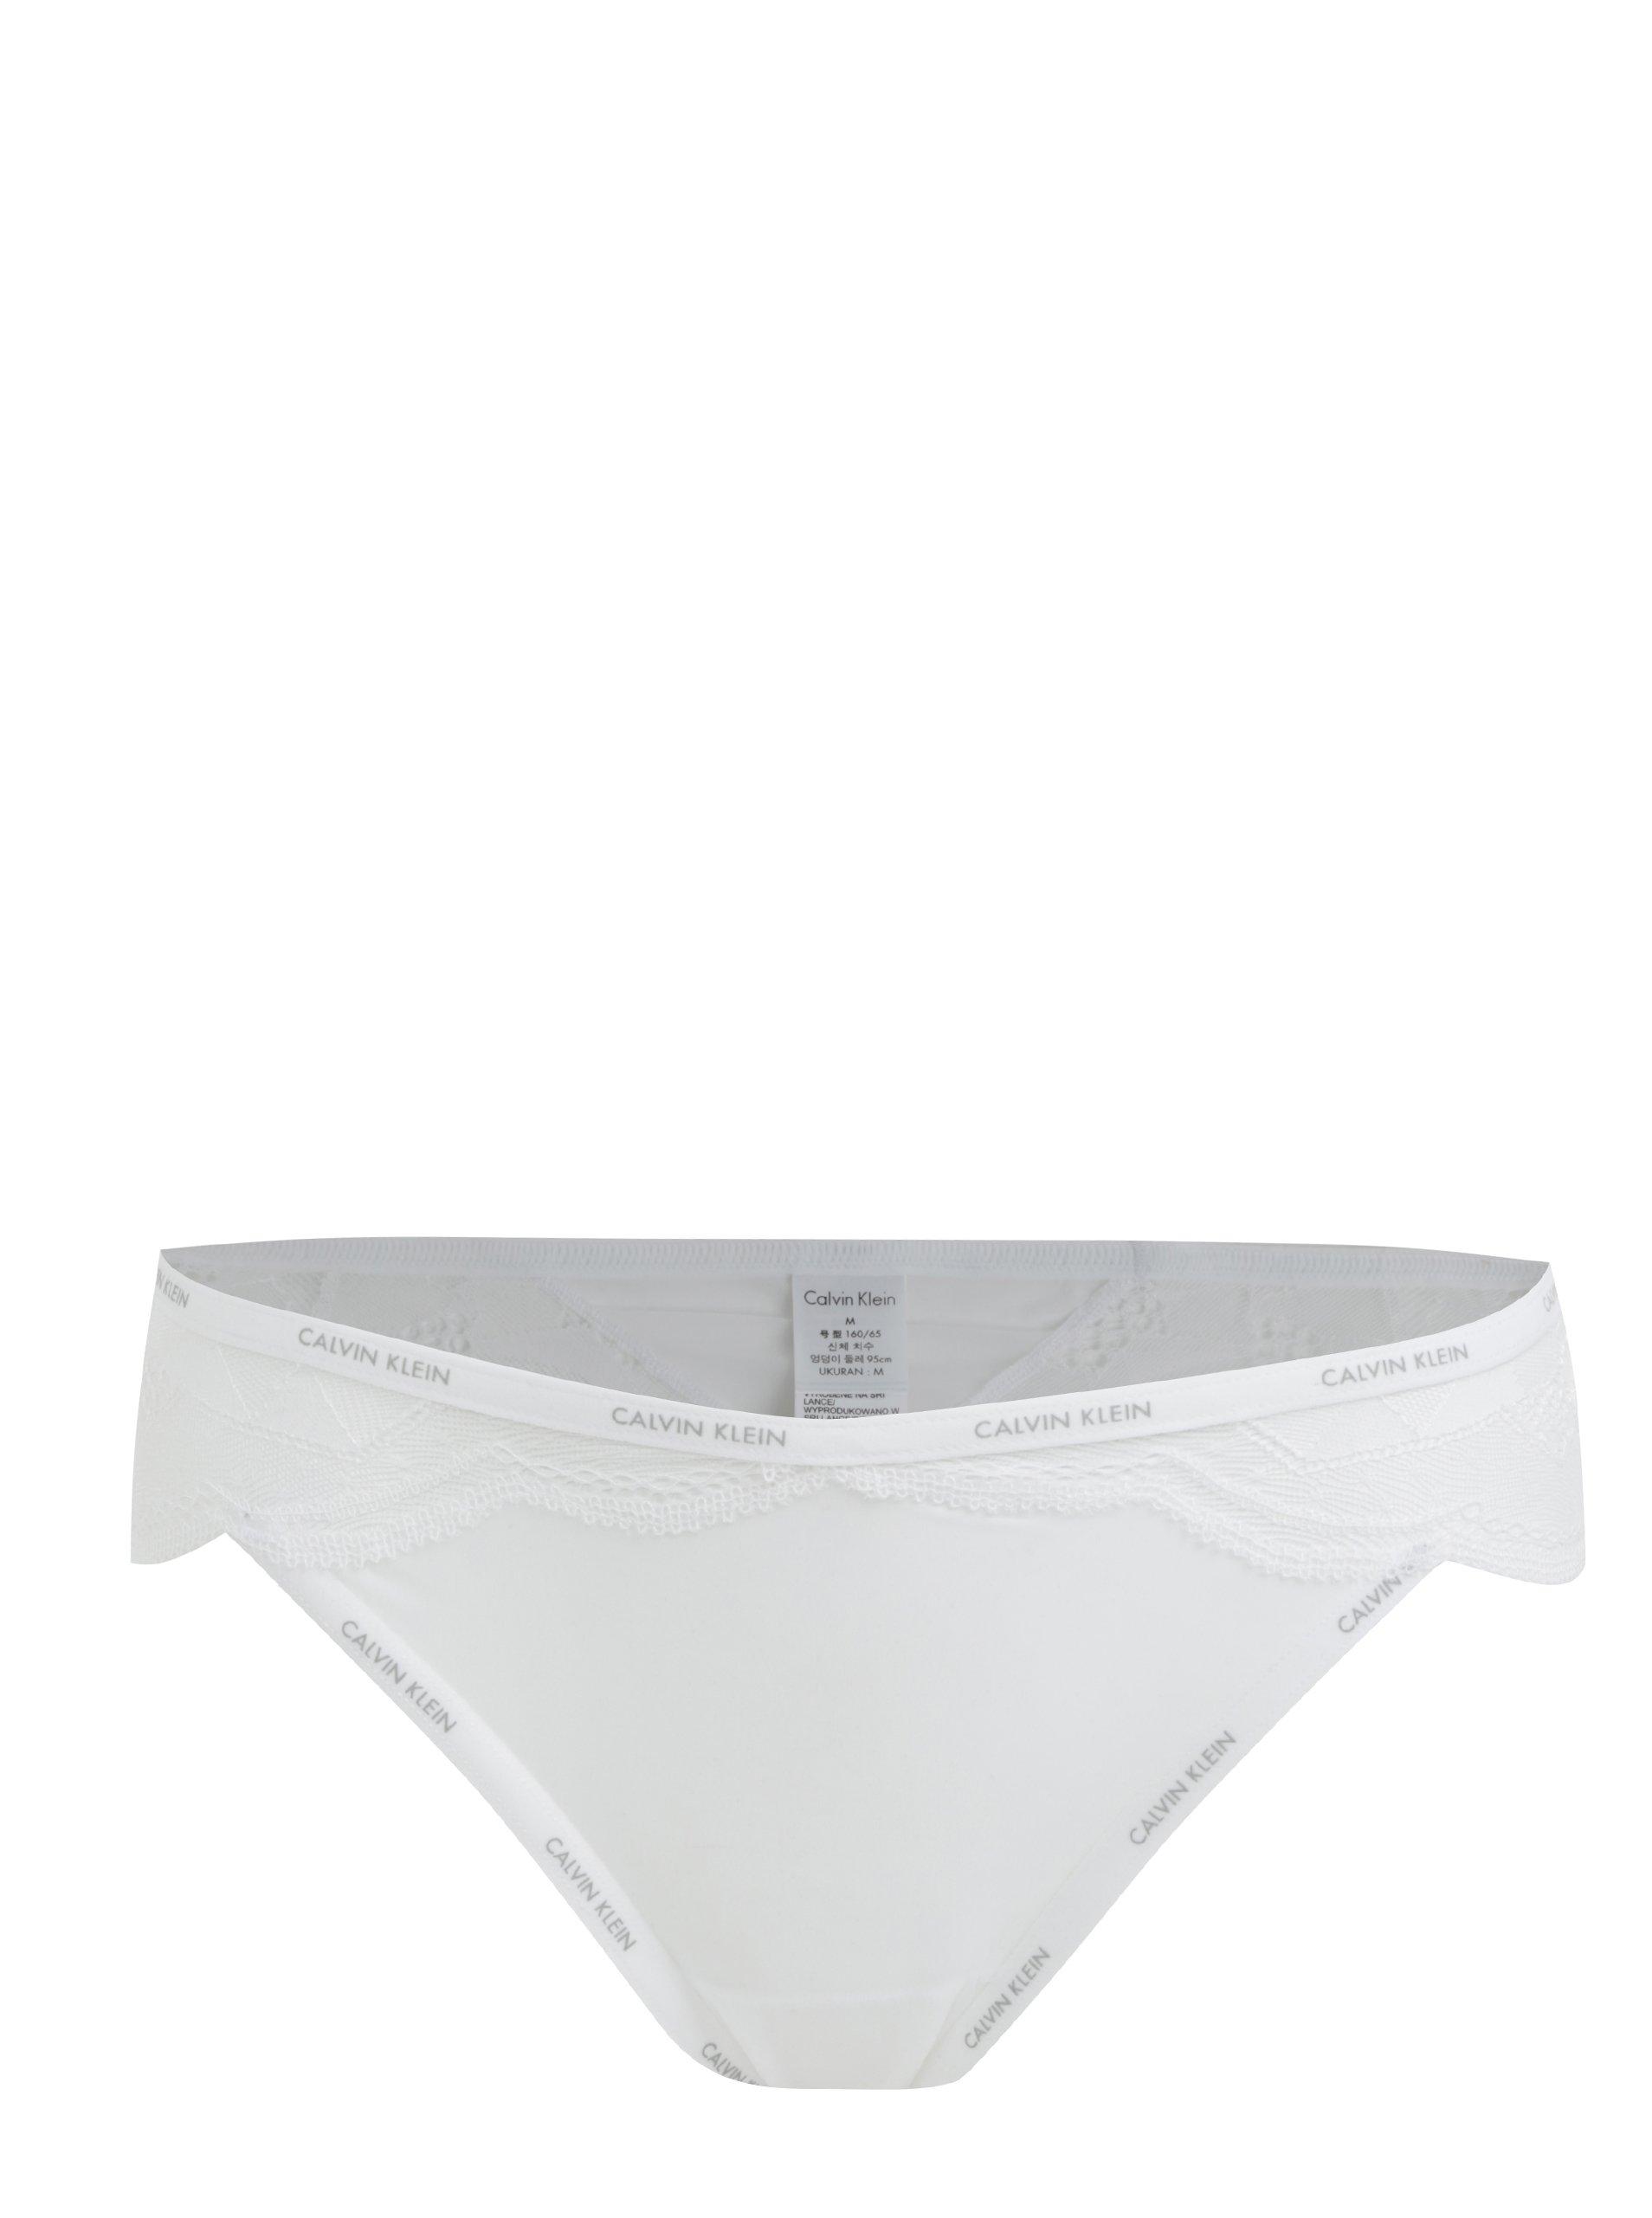 Bílé krajkové dámské kalhotky Calvin Klein